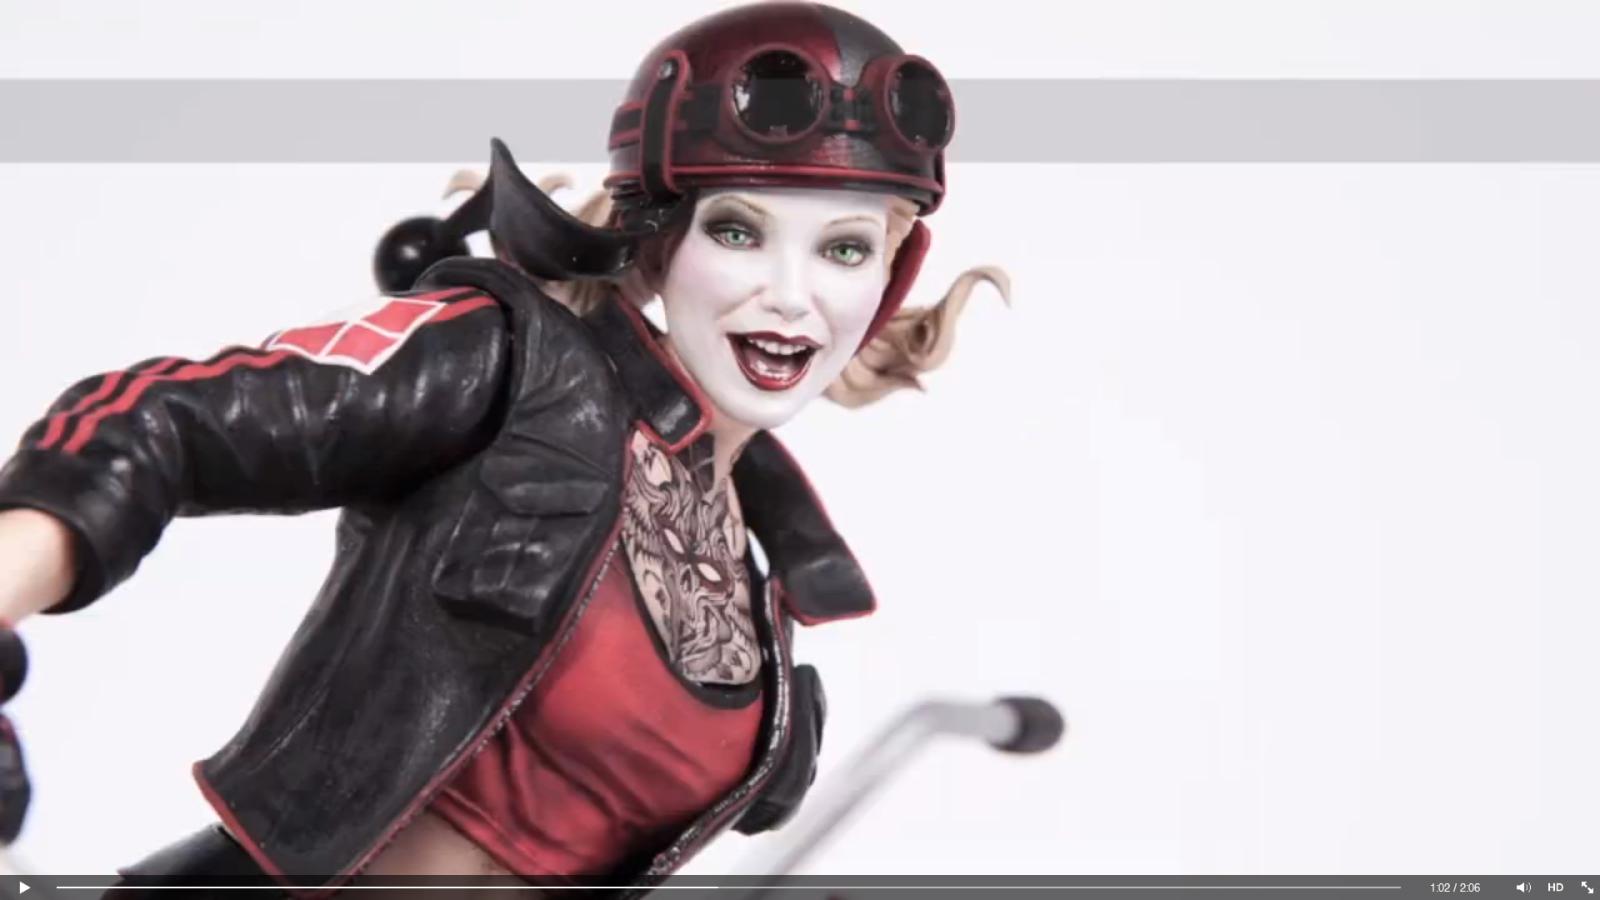 NOVITÀ | Animetoys Milano - Modellismo, Action Figures